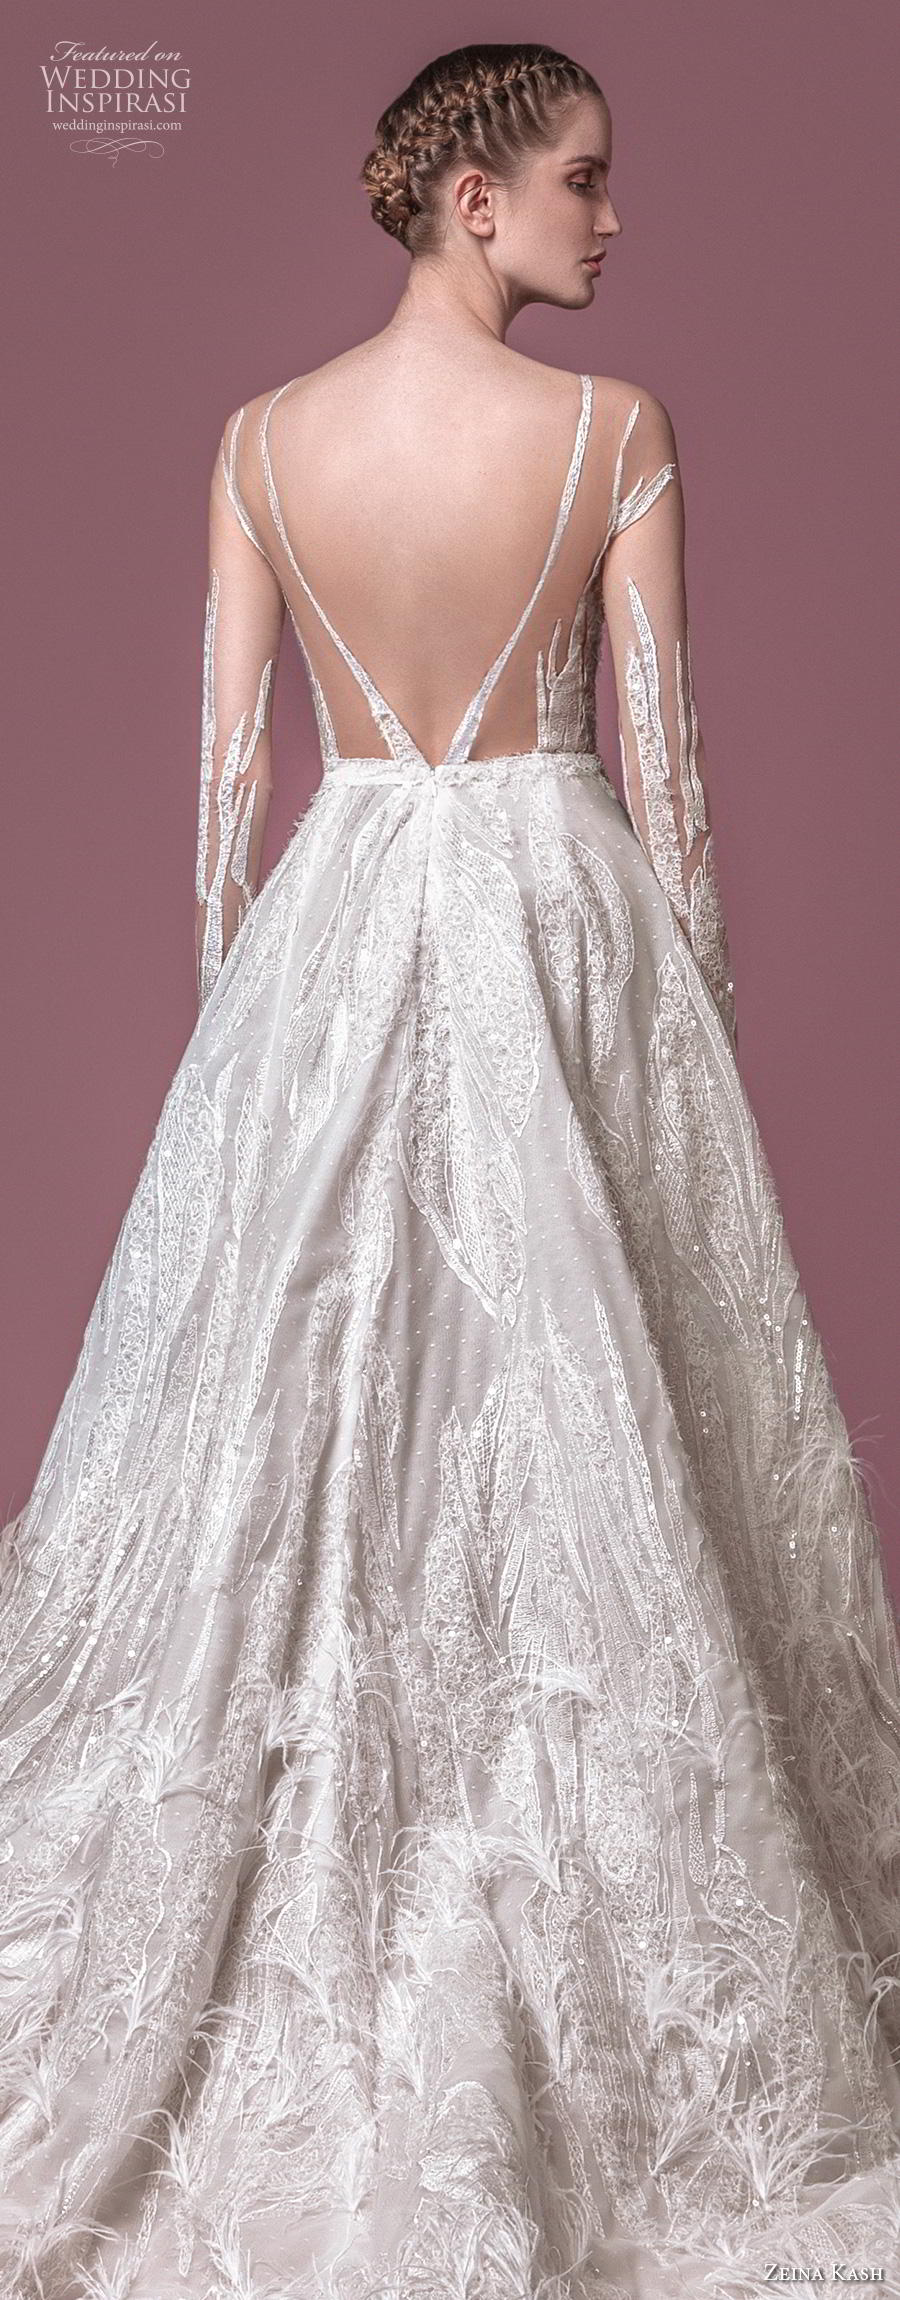 zeina kash 2018 bridal long sleeves illusion jewel full embellishment glitzy glamorous a  line wedding dress blackless open back chapel train (2) zbv